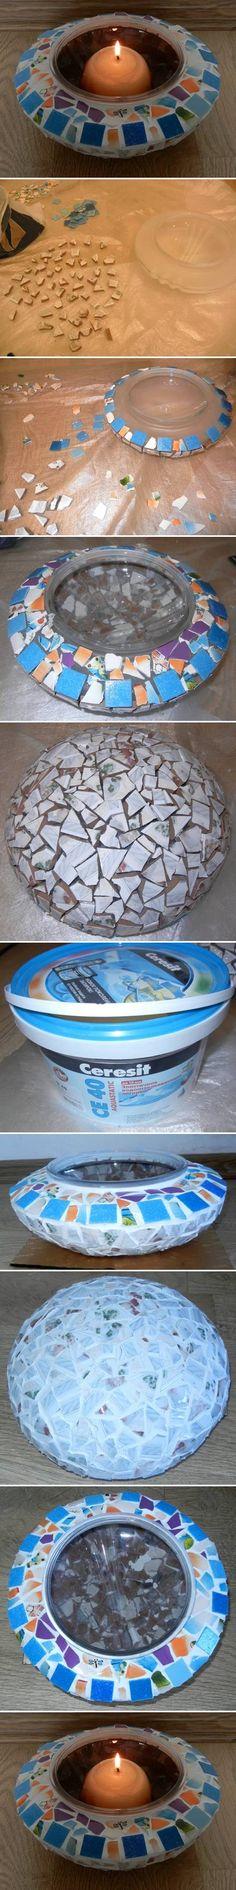 DIY Mosaic Candle Holder